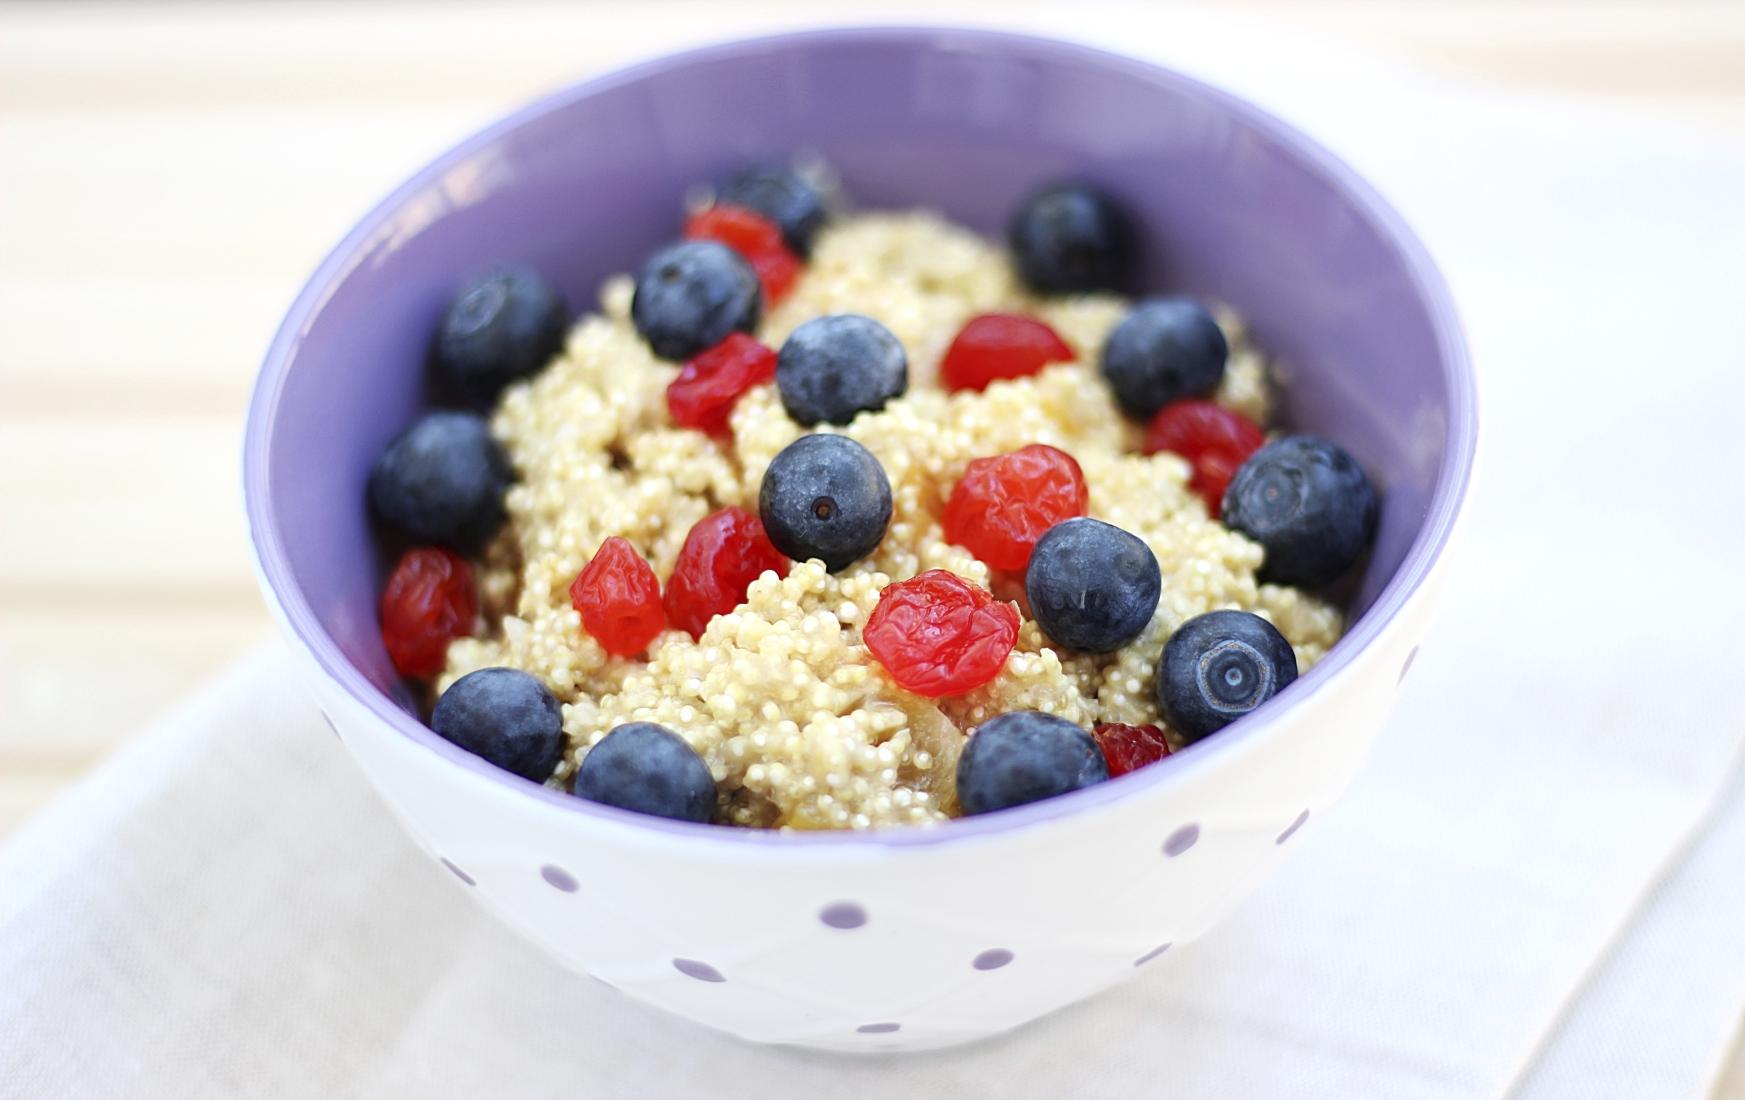 Buckwheat for Cardiovascular Health, Stroke Prevention, and Diabetes